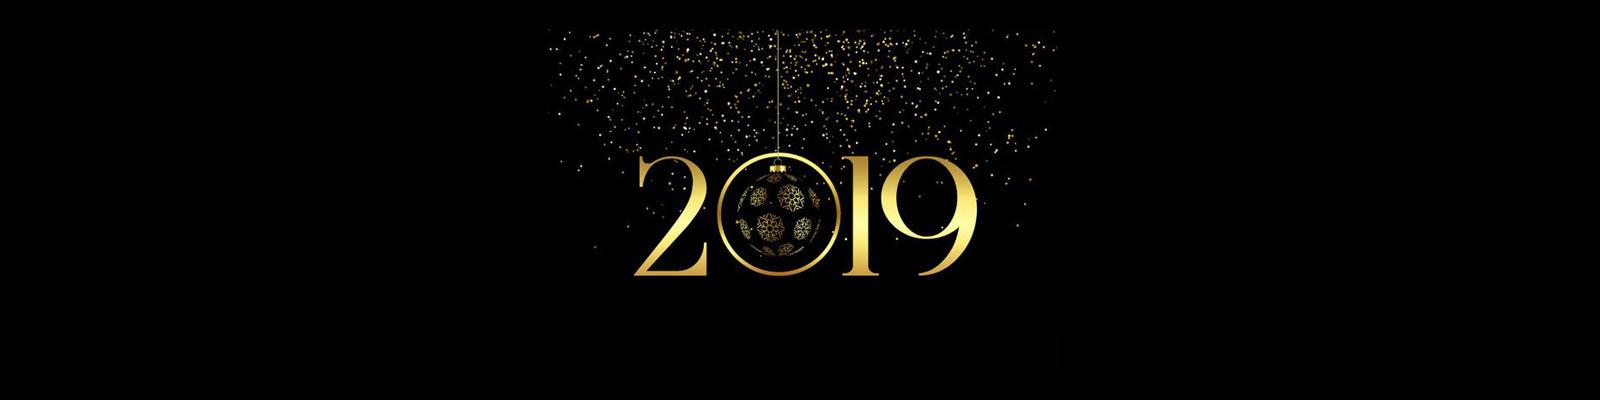 2019-fe.jpg